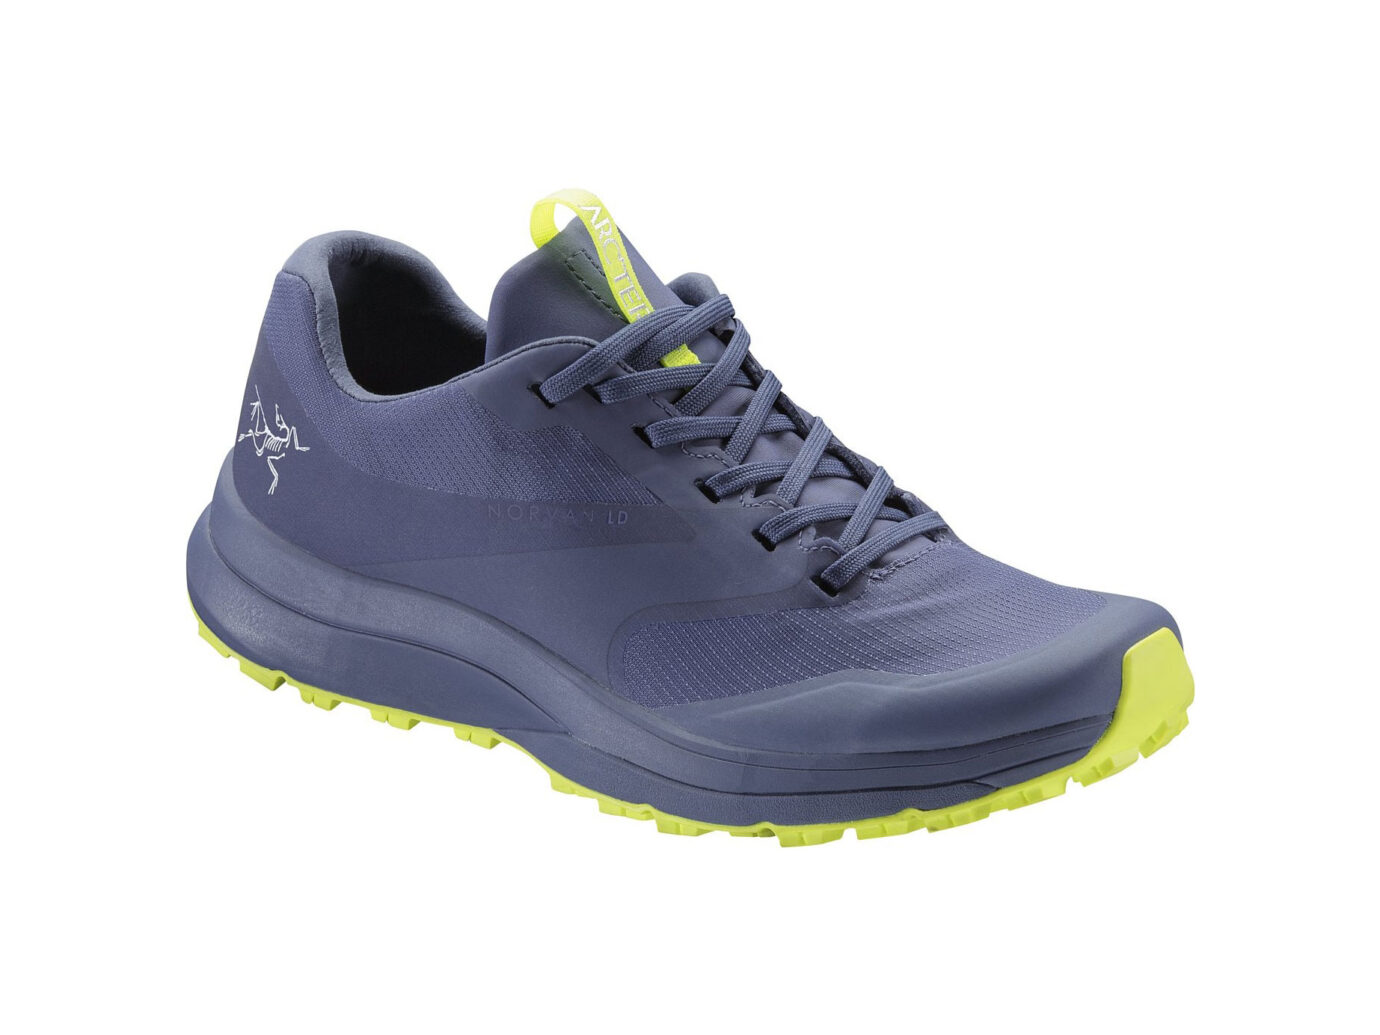 Arc'teryx Norvan LD Trail Running Shoe